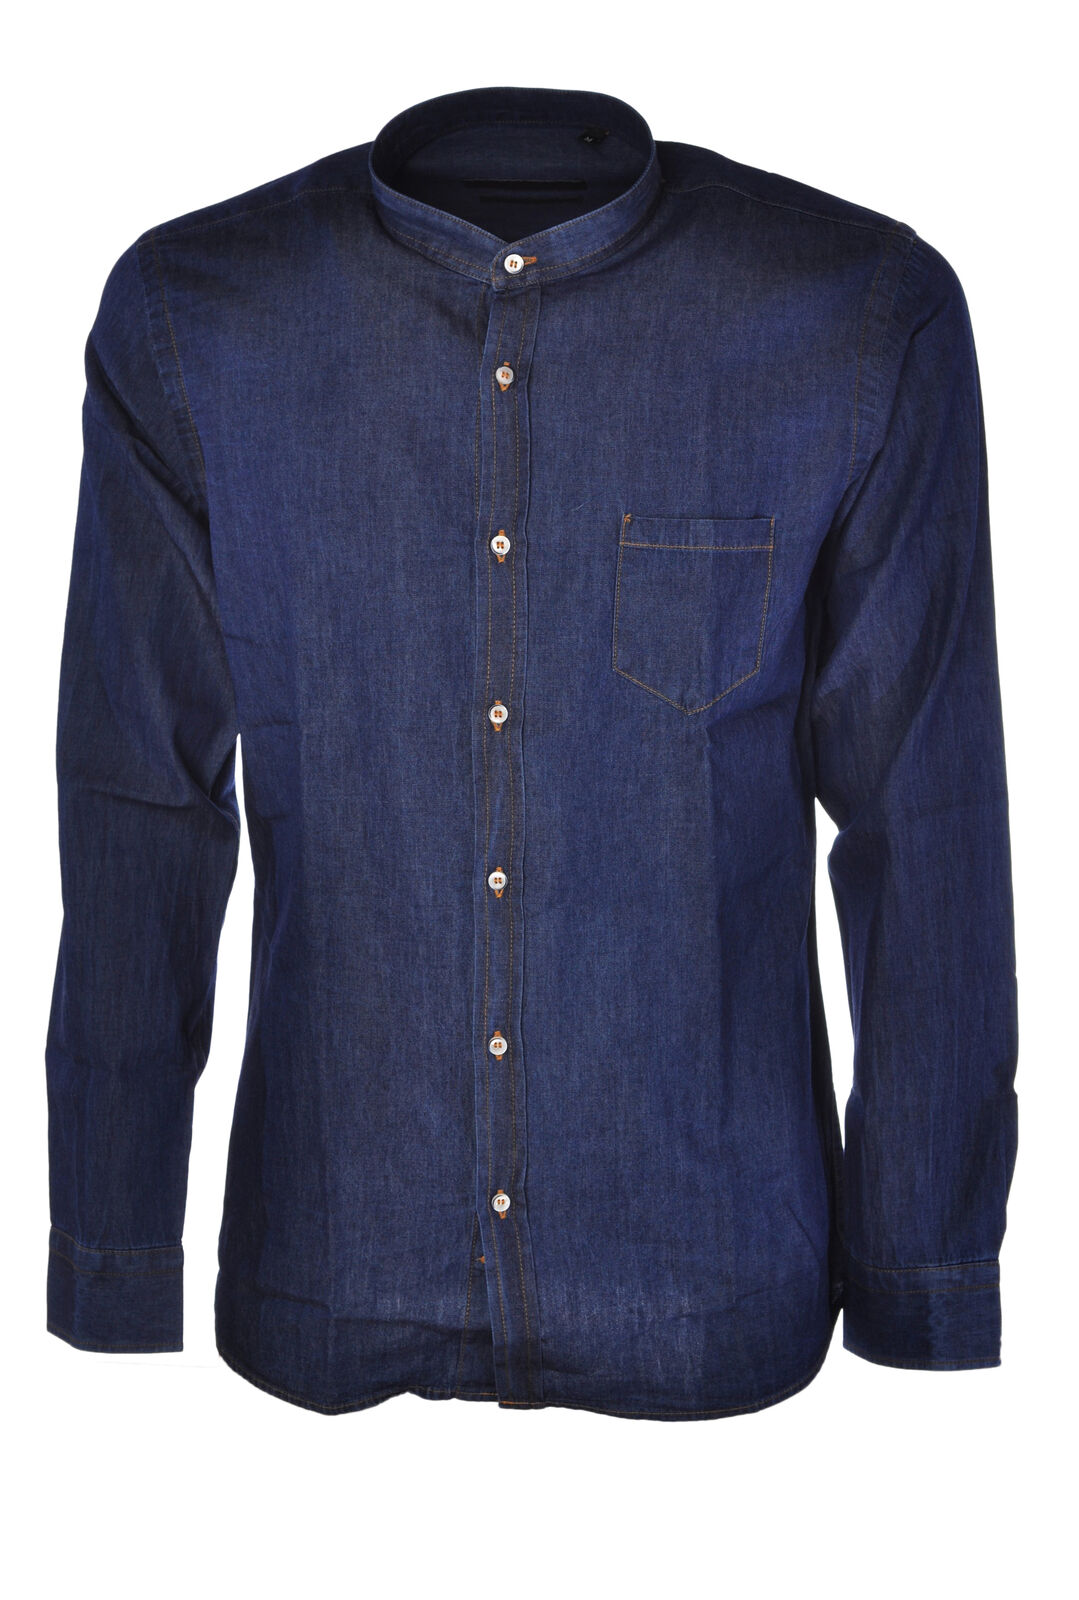 Laboratori Italiani  -  Shirts - Male - Denim - 3436320A185204